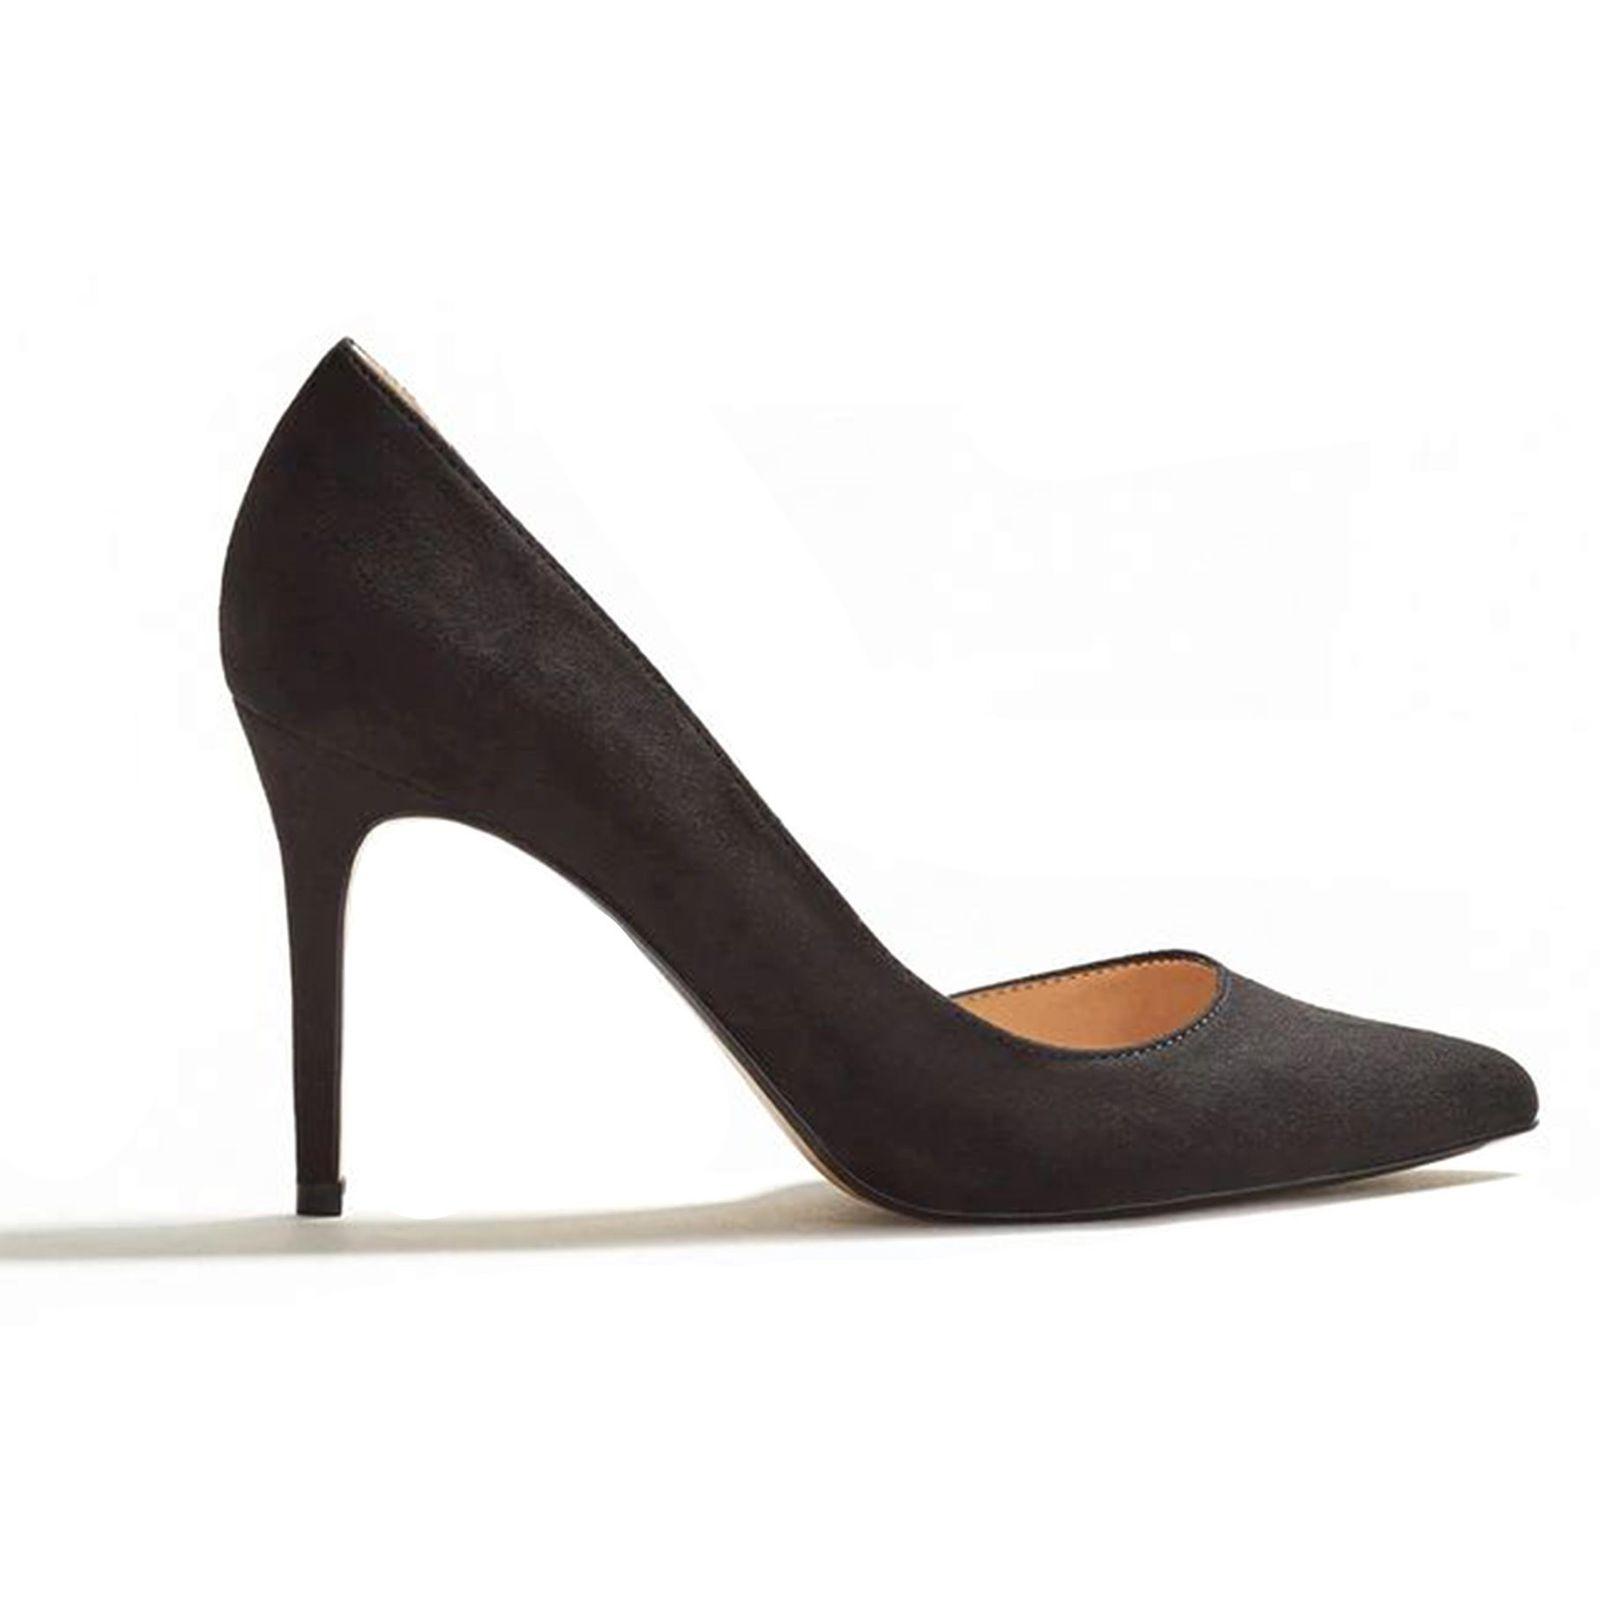 کفش پاشنه بلند زنانه - مانگو - مشکي - 1